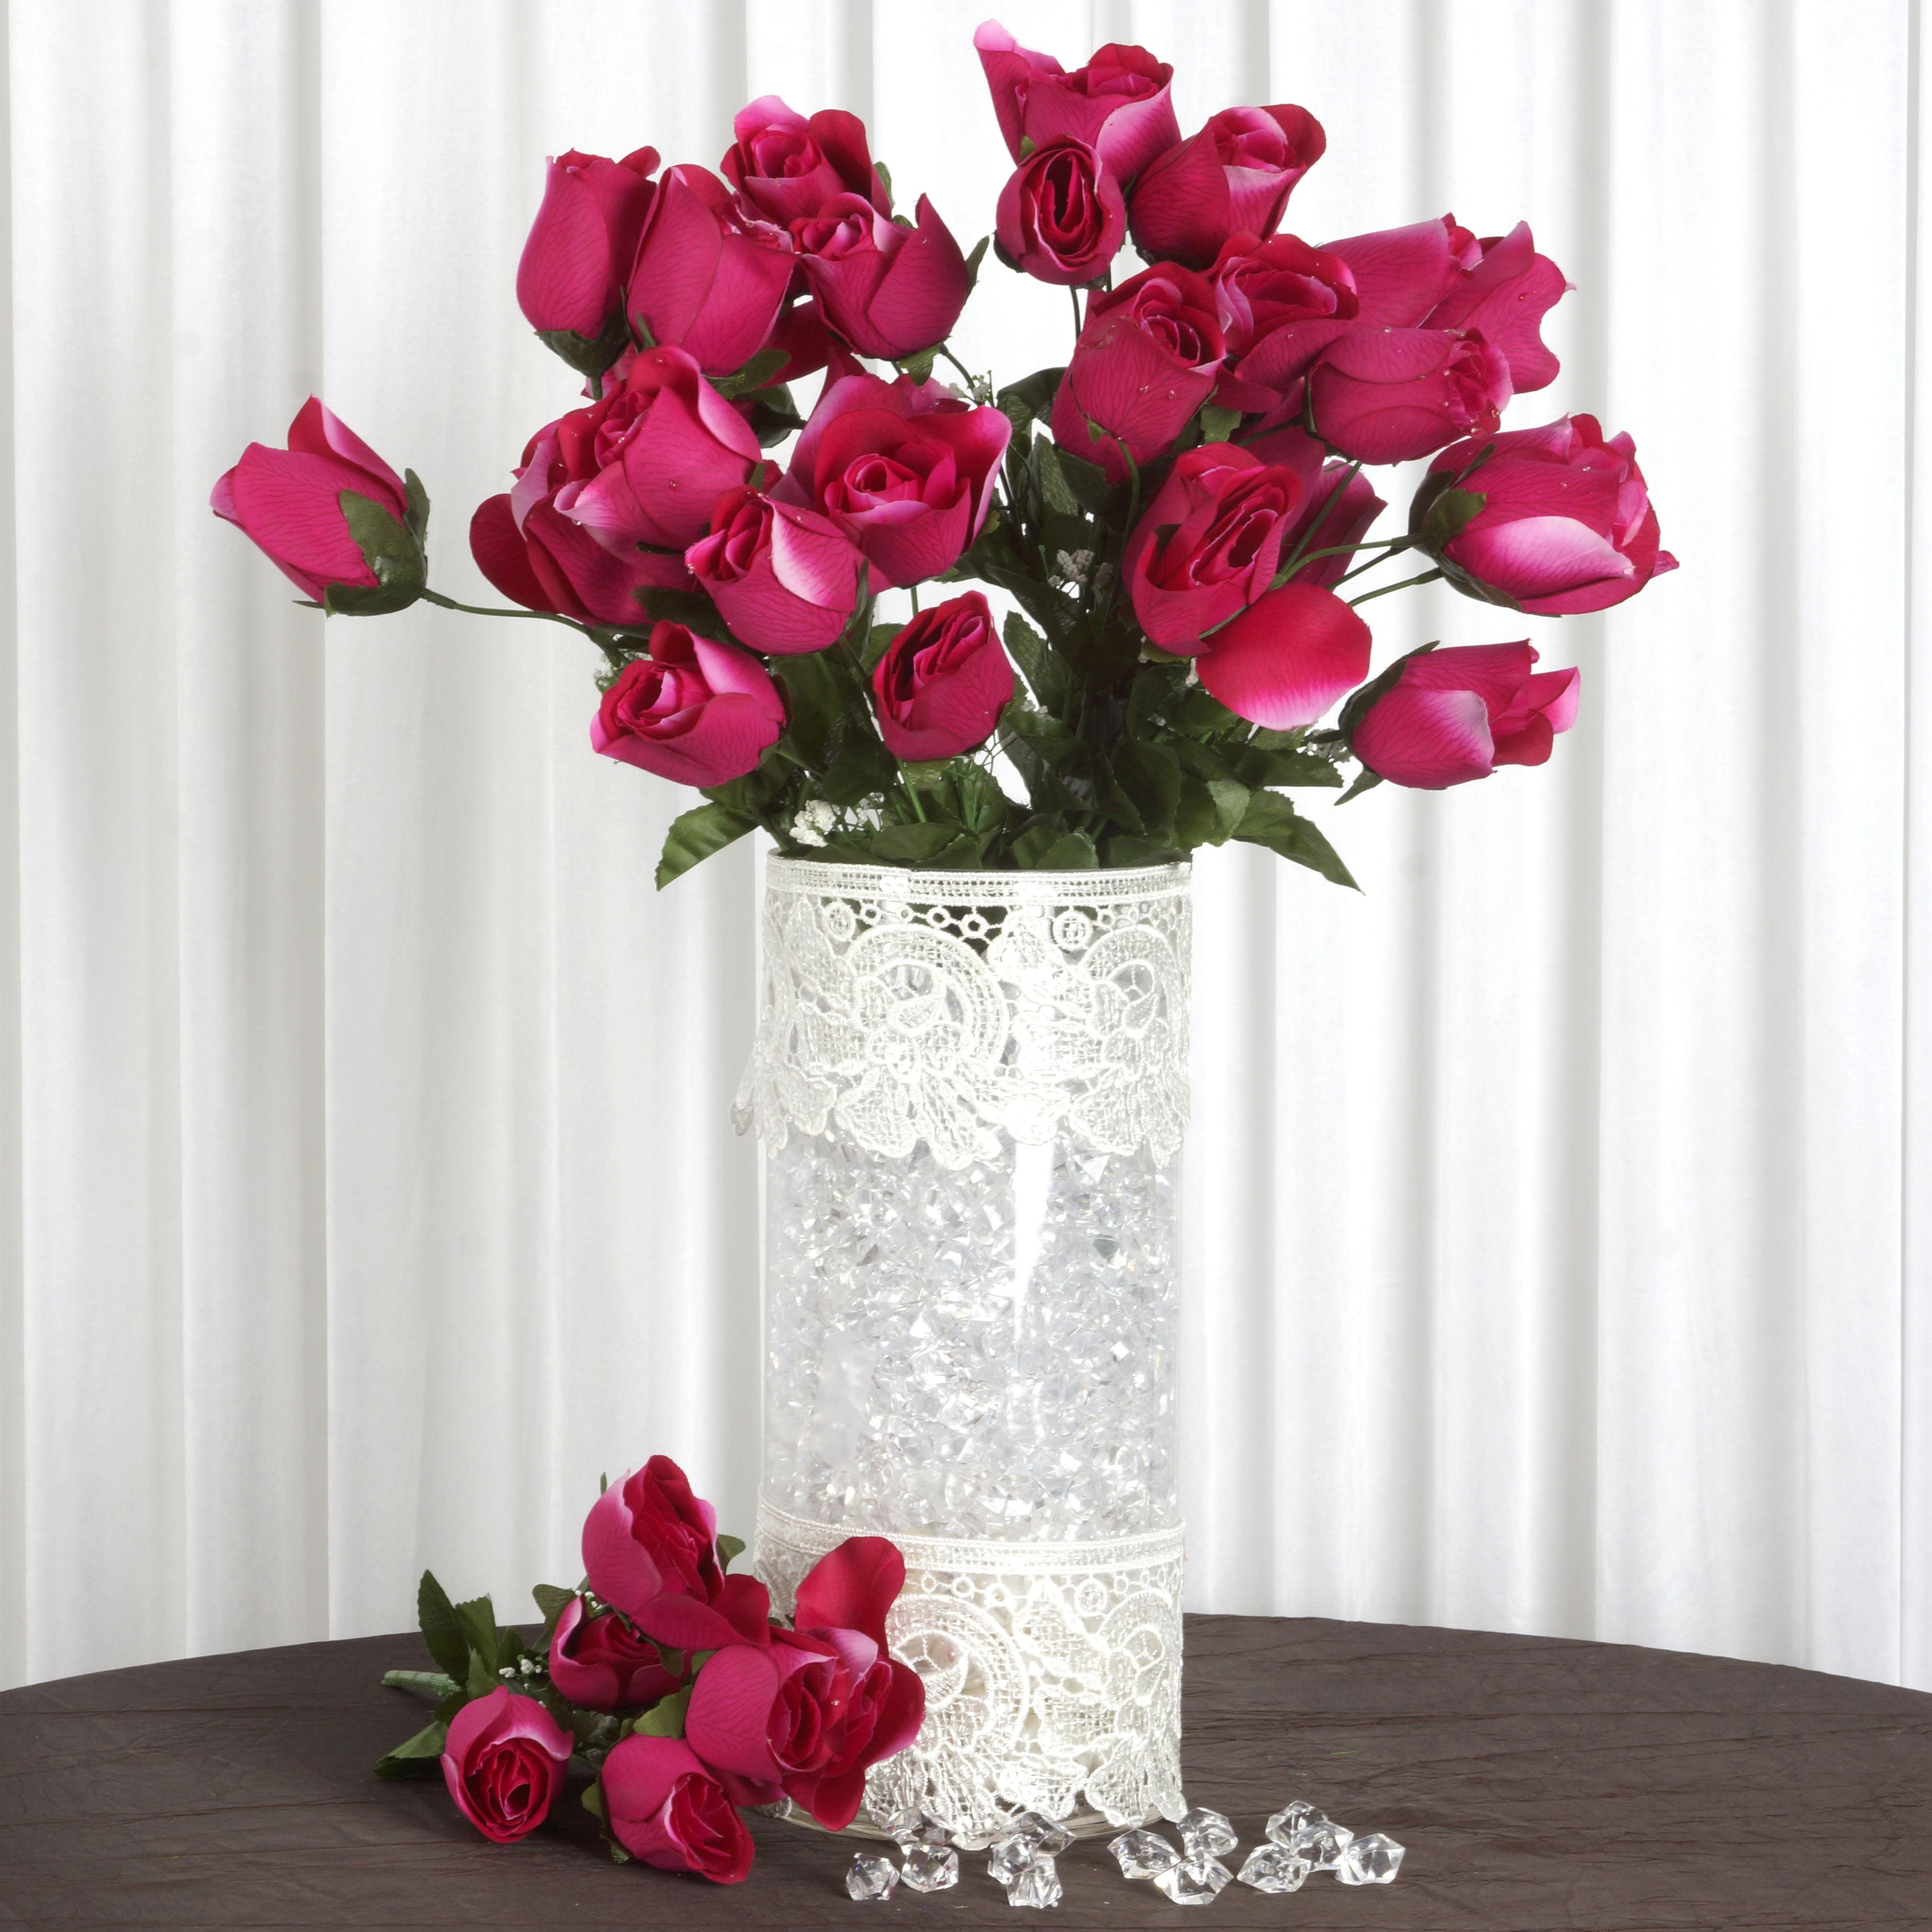 60 Roses Bud FUCHSIA PINK Silk Wedding Flowers DIY Bouquets Centerpieces